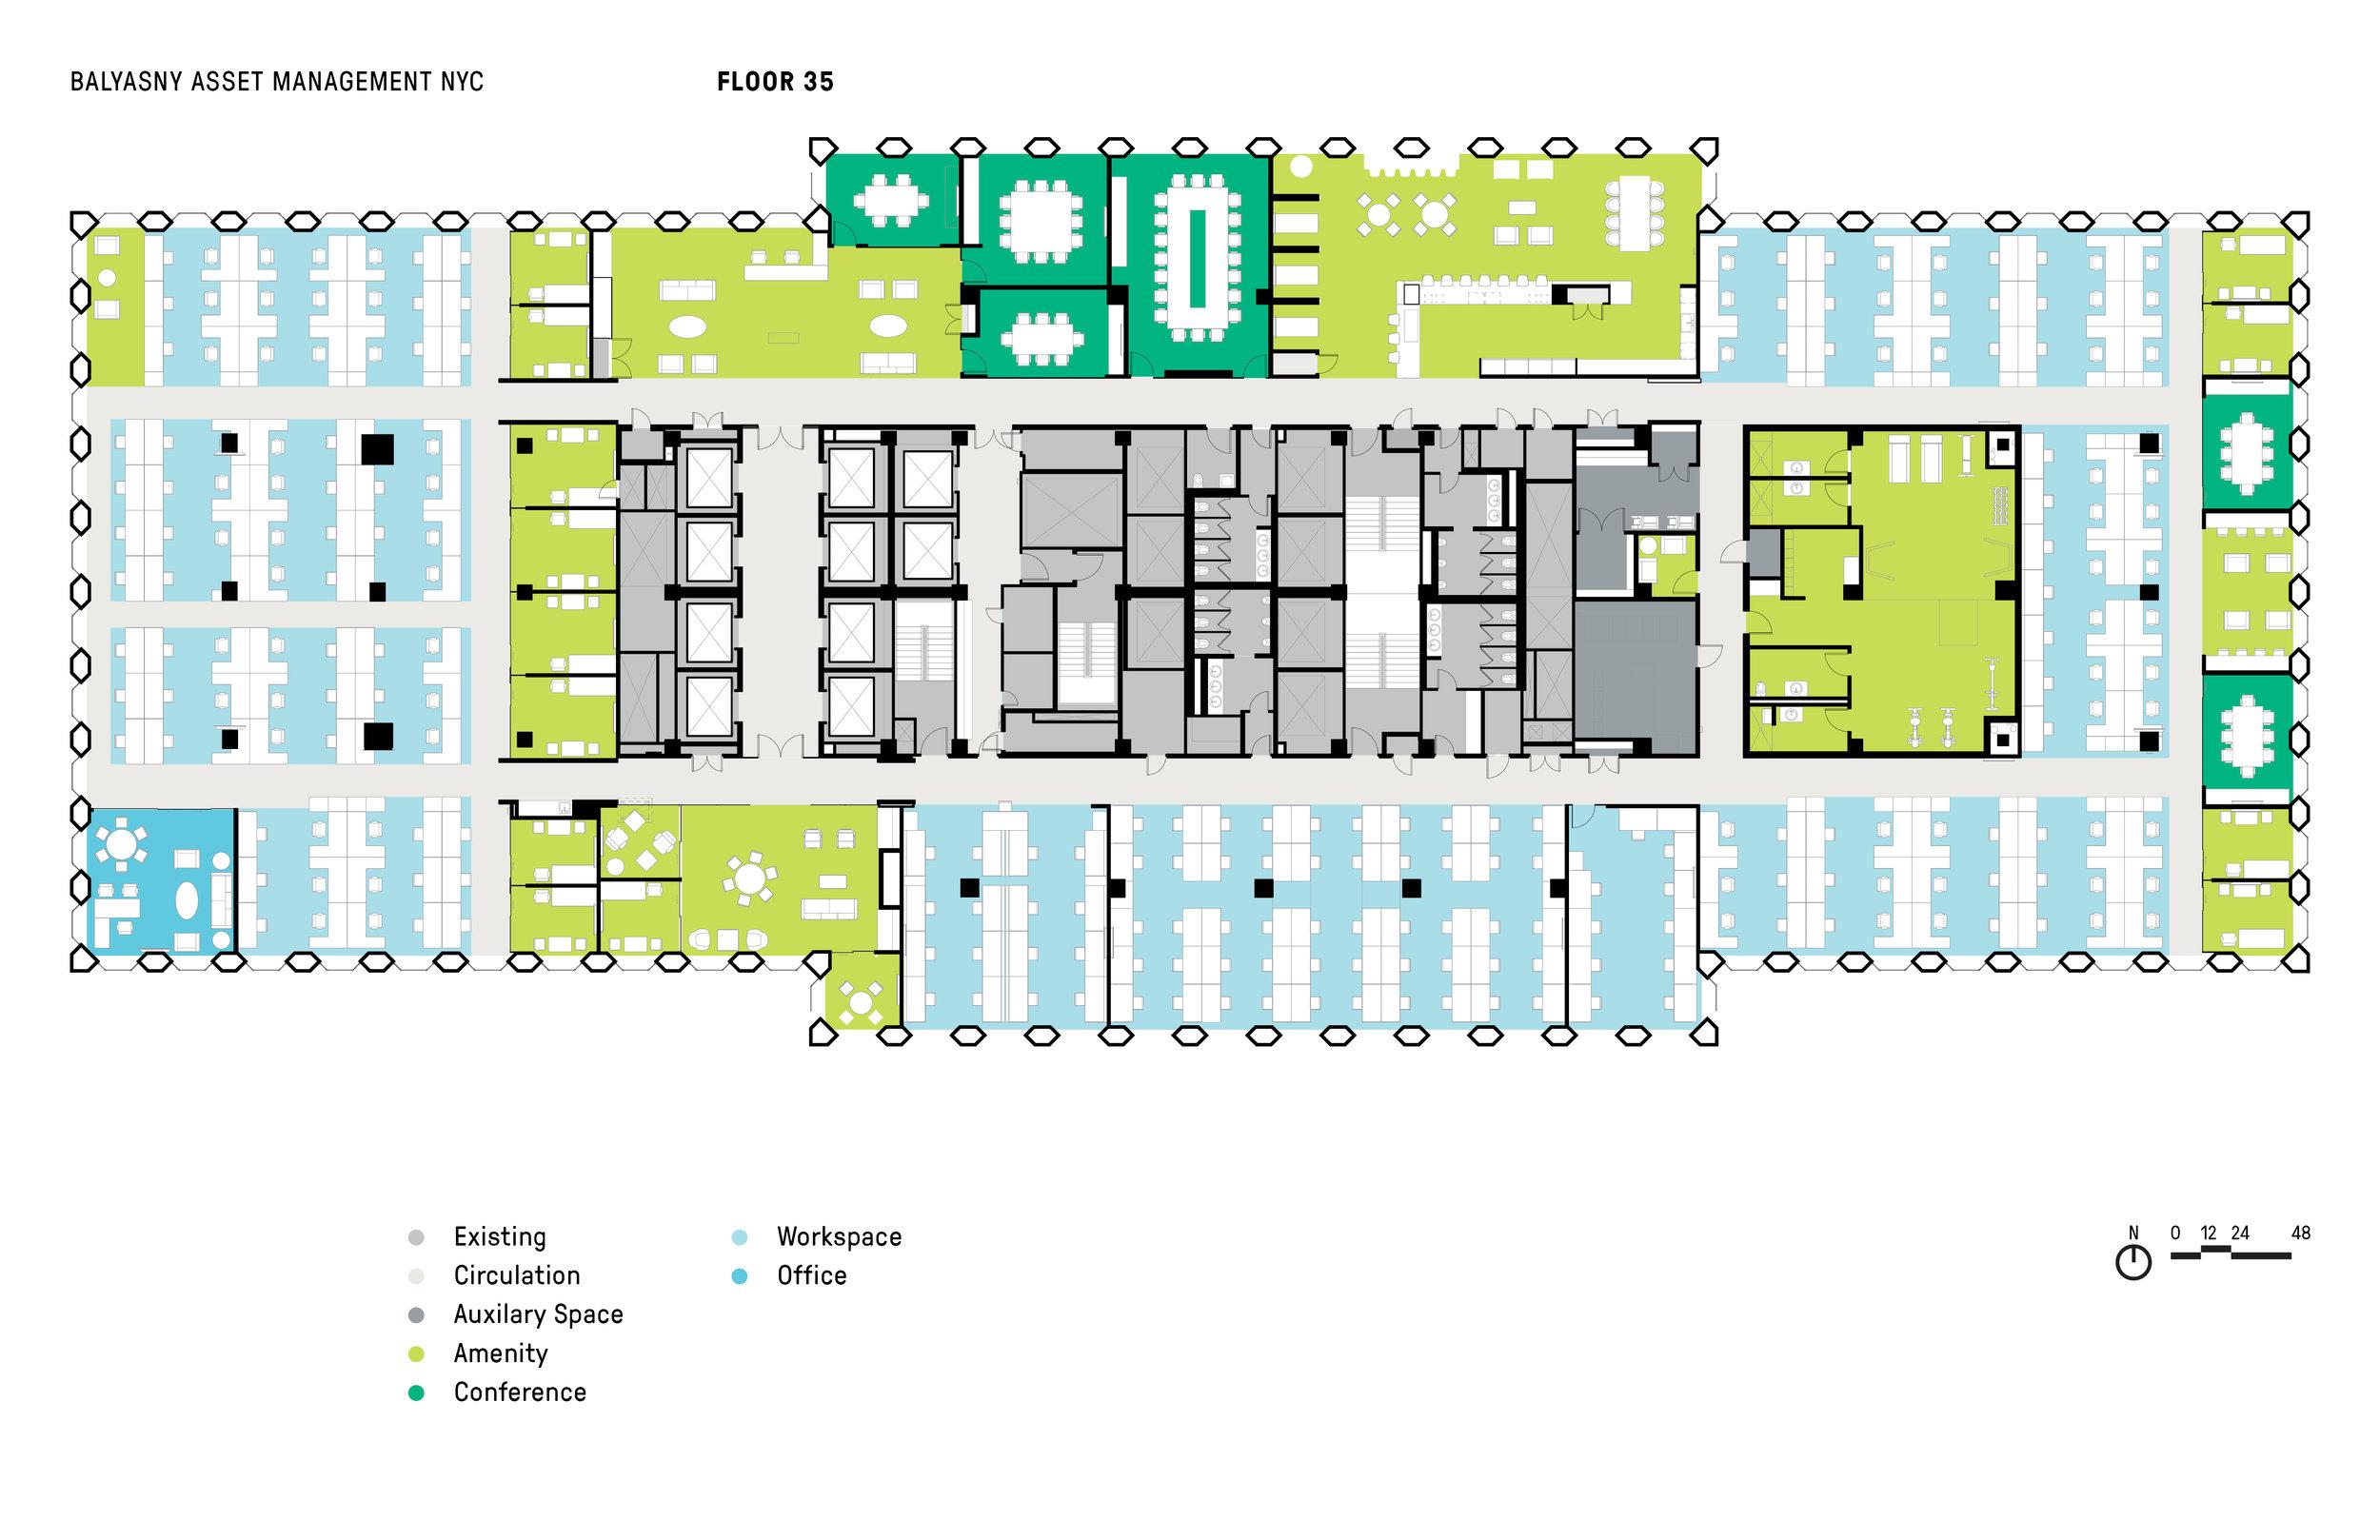 BAMNY_plan_floor35_02.jpg